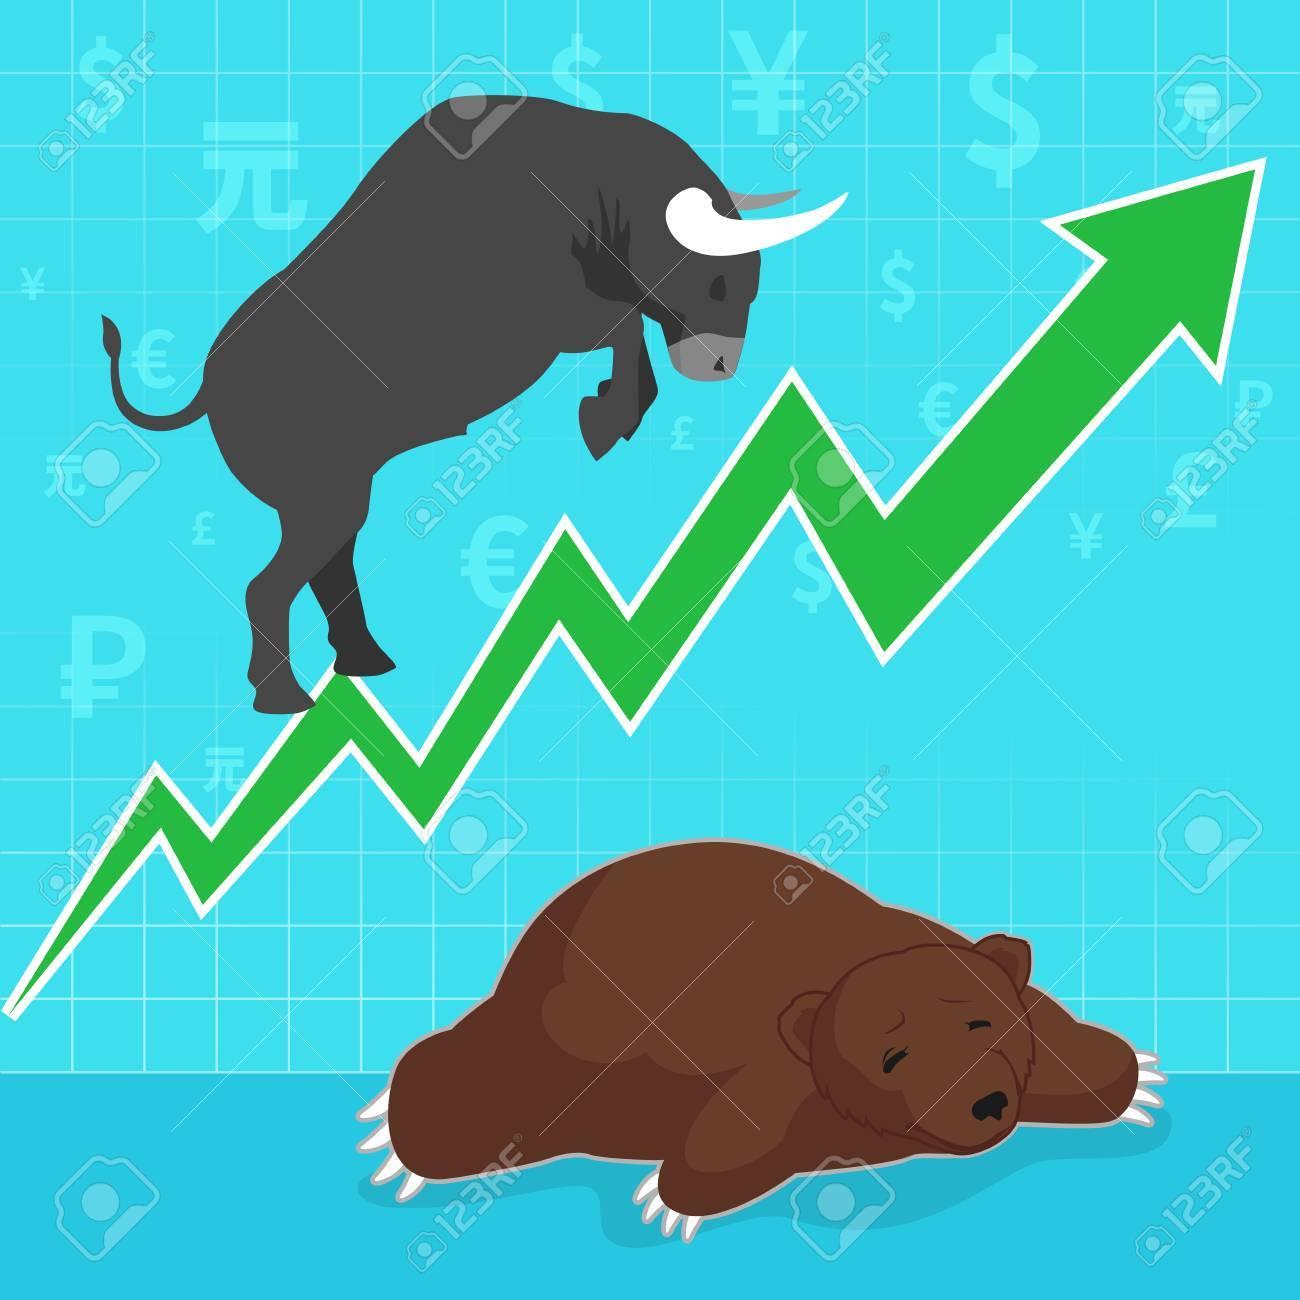 Stock market concept bull and bear - 45285235